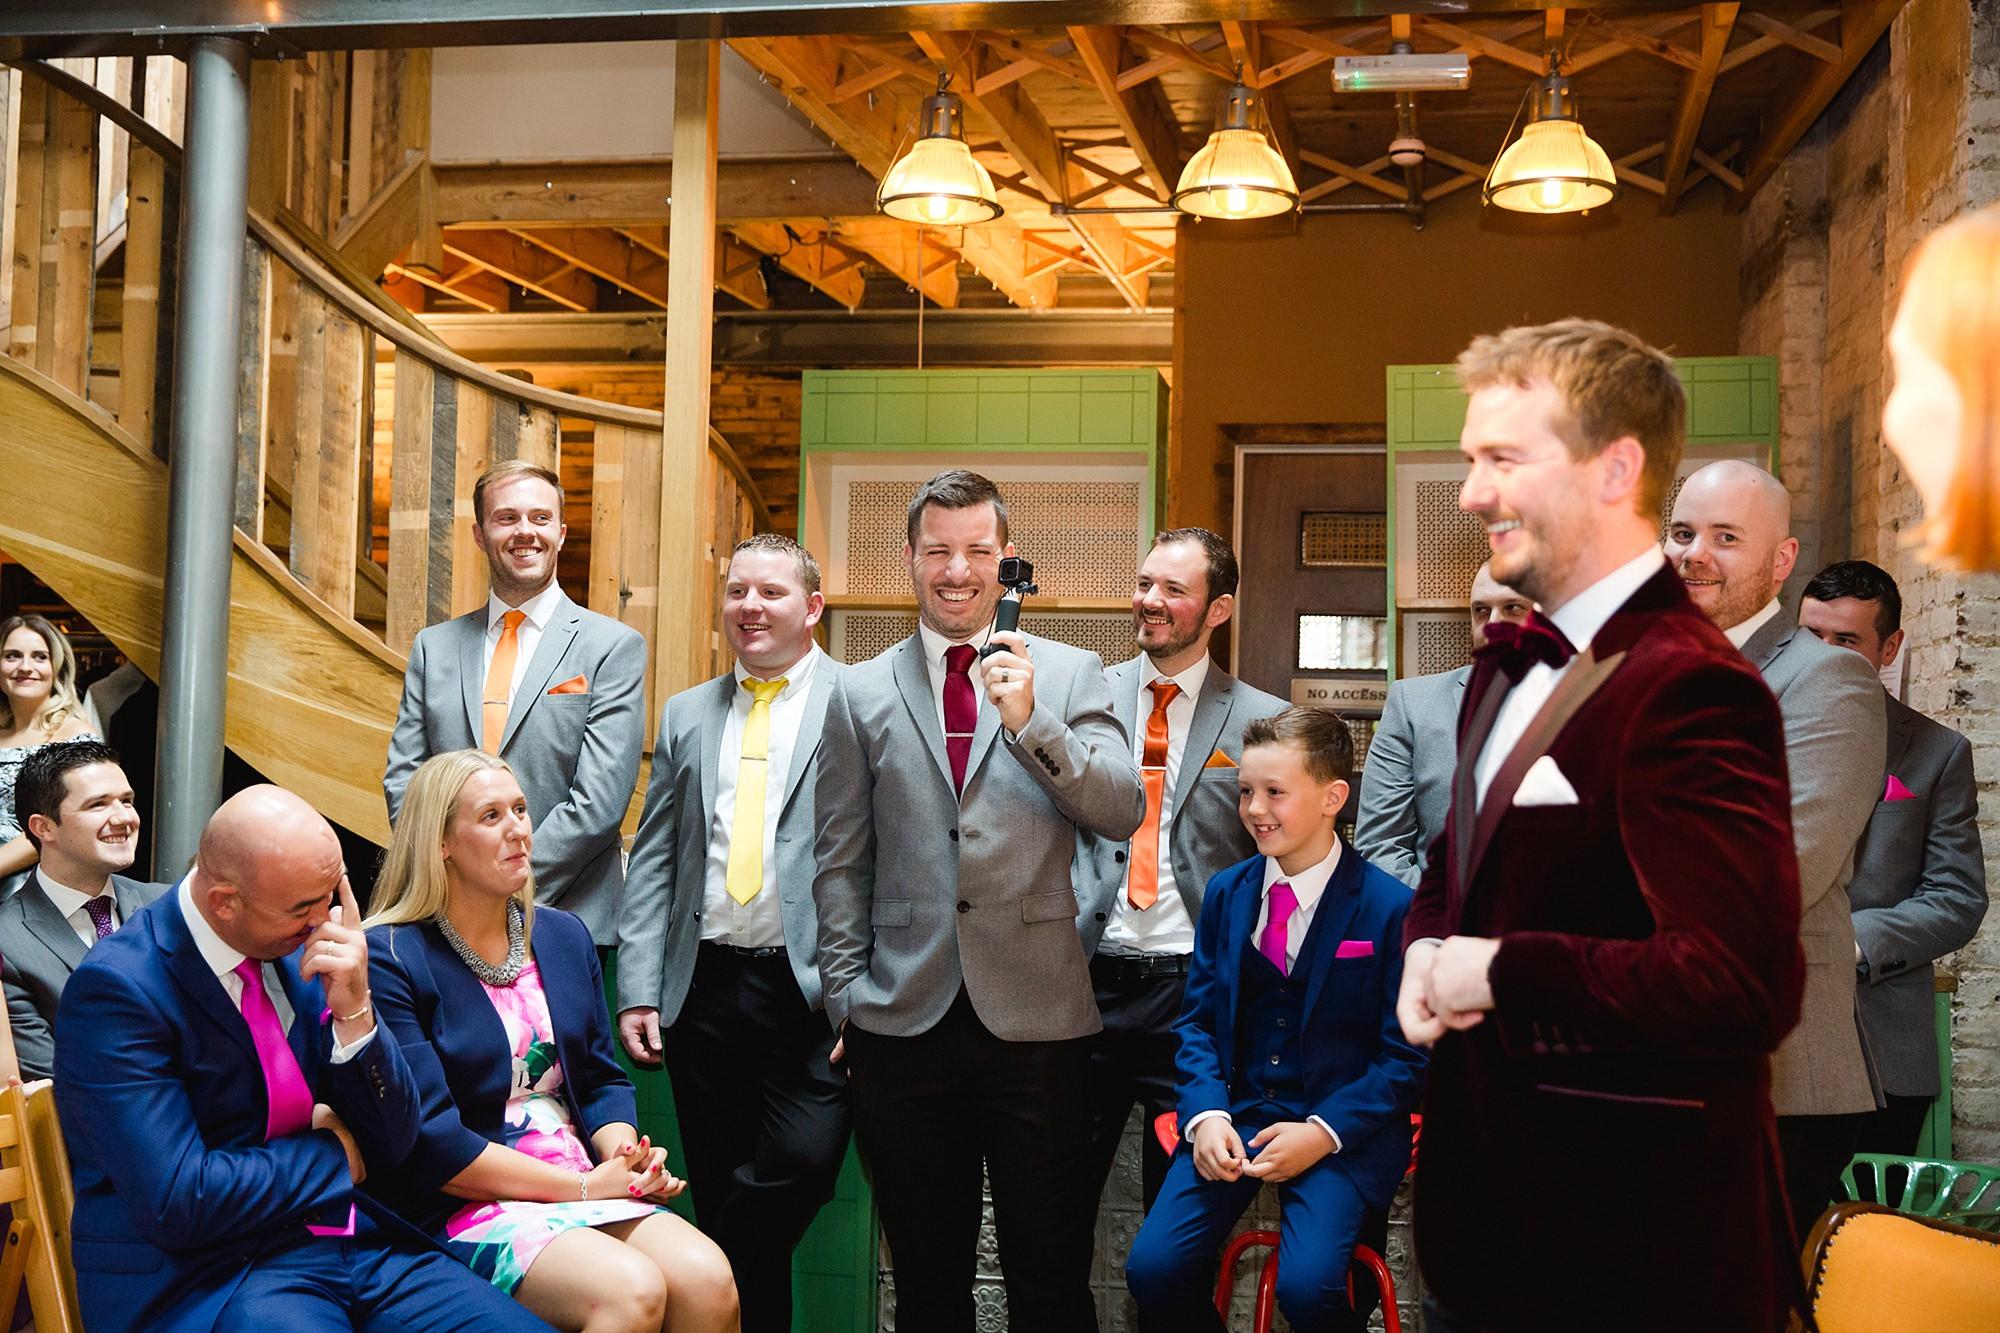 Fun London Wedding portrait of groomsmen with go-pro camera